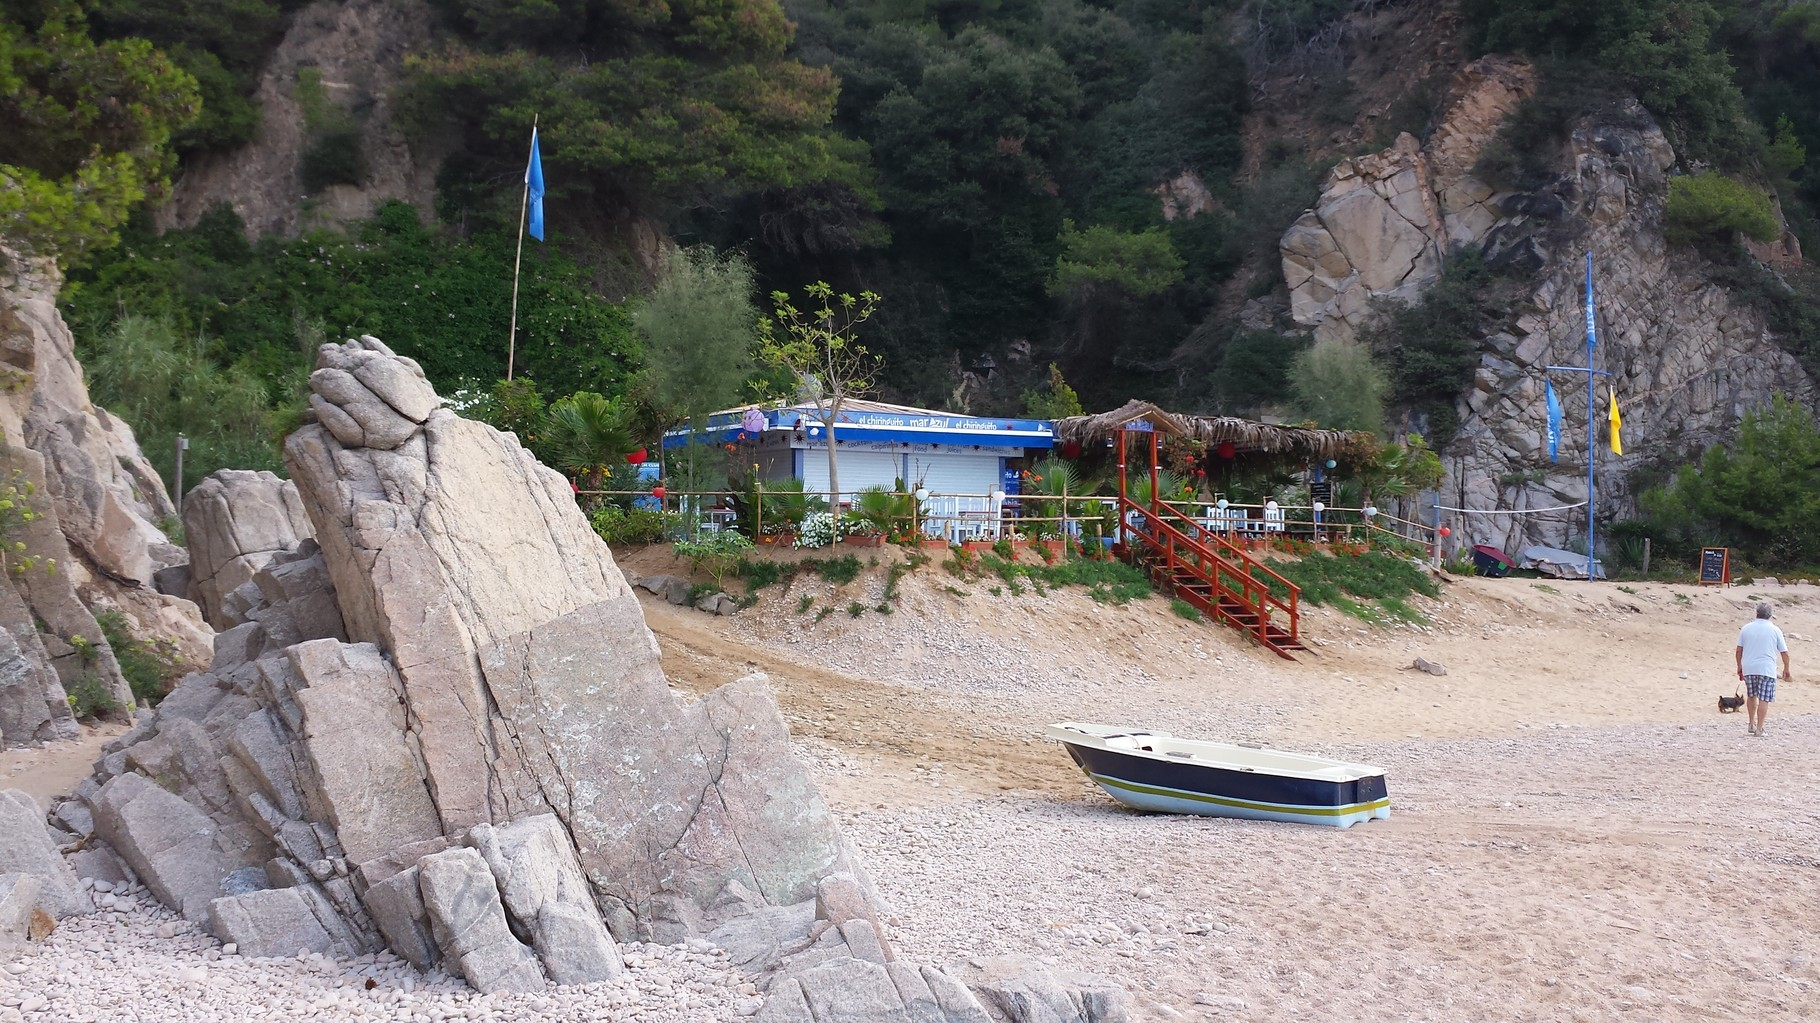 Chiringuito sur la plage